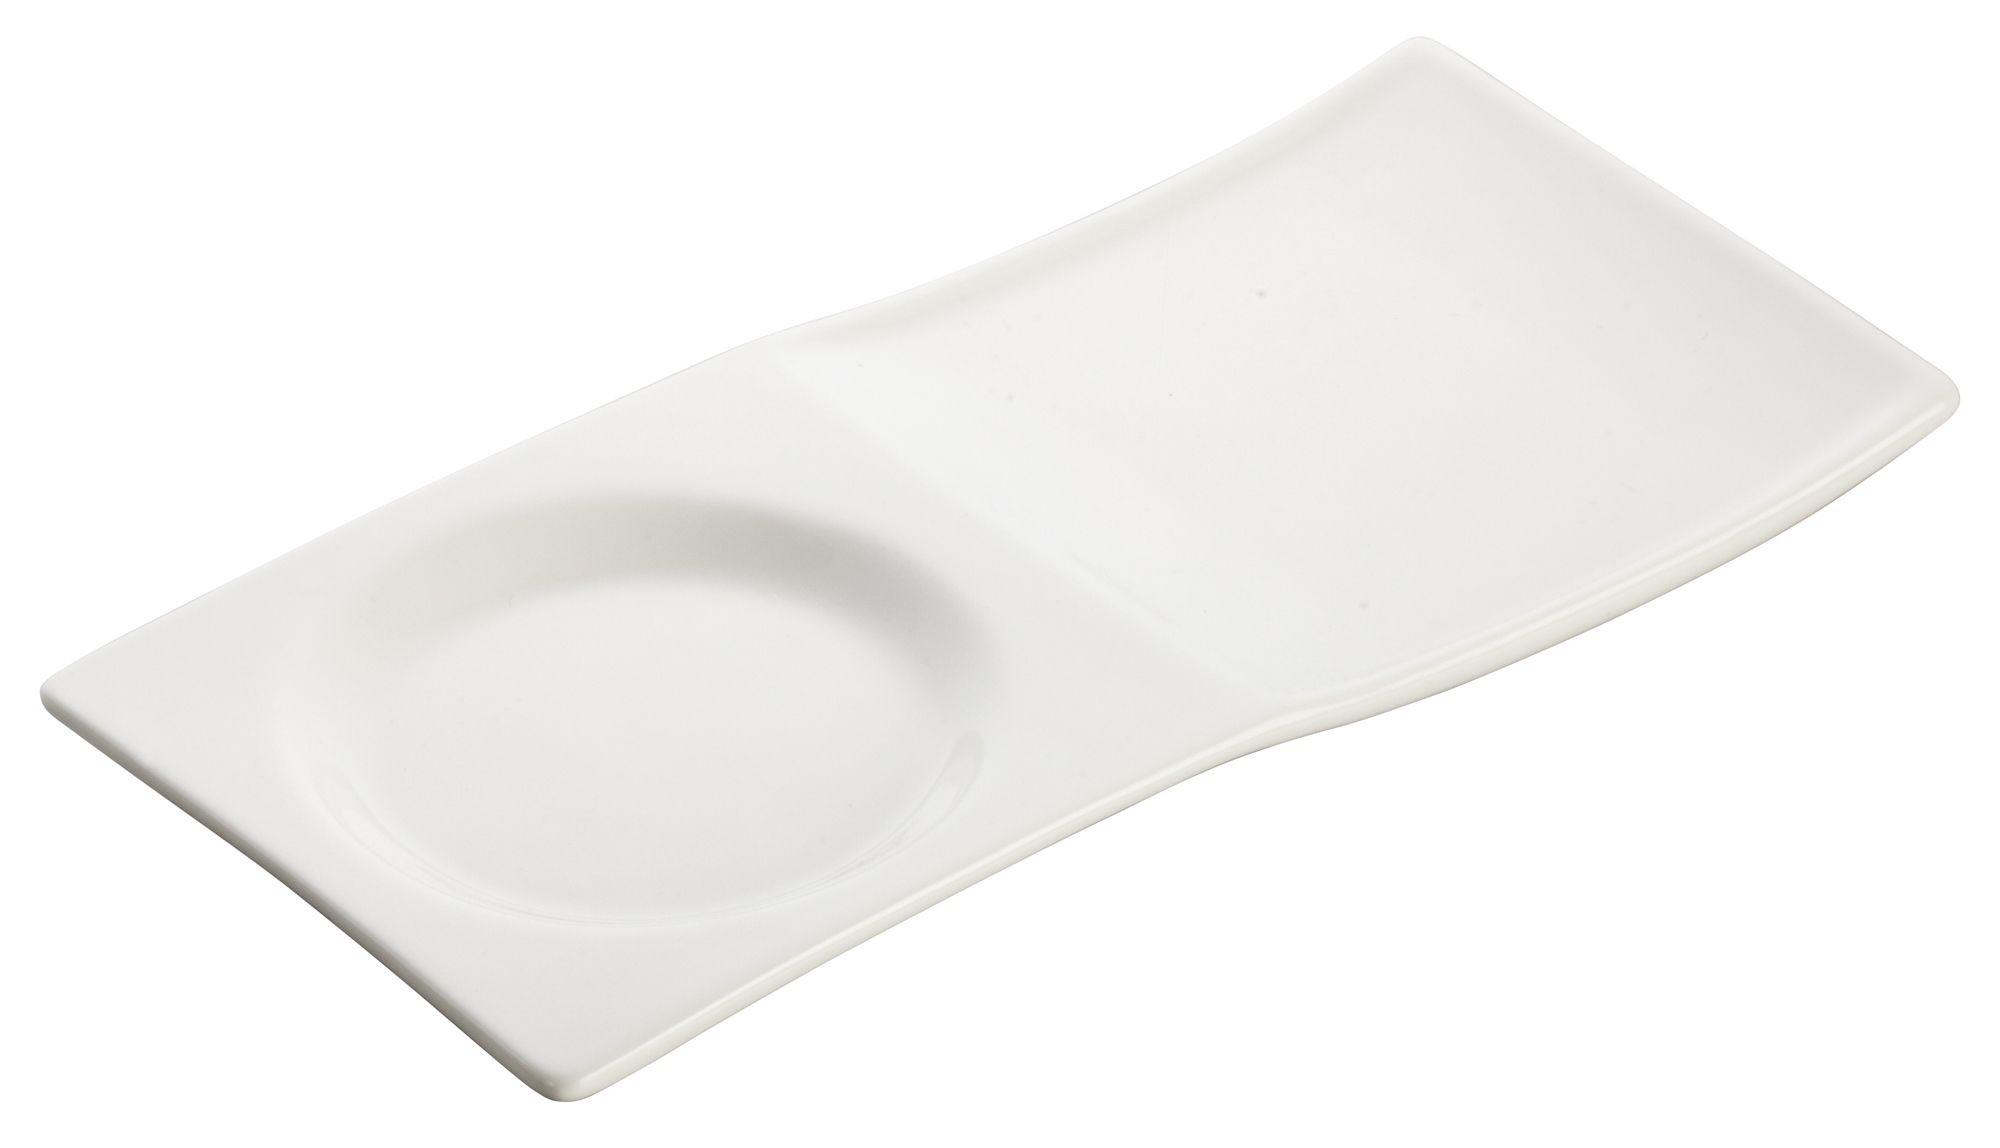 "Winco WDP012-101 Tenora Porcelain Bright White Tray 8"" x 3-3/4"""